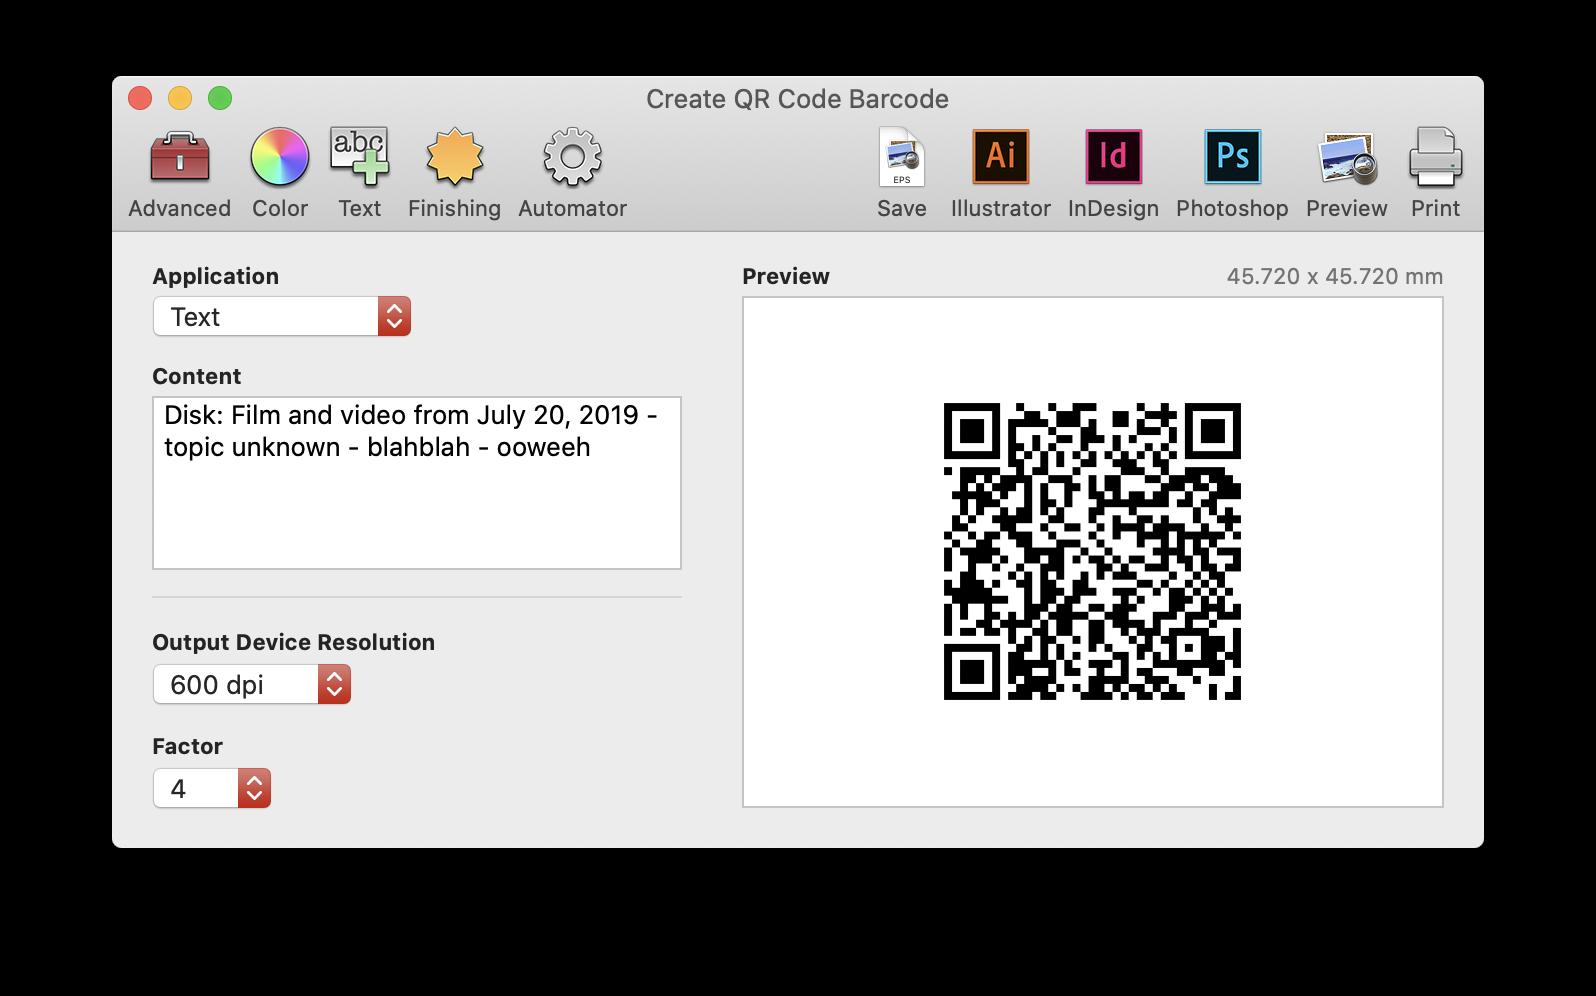 Create QR Code Barcode screen